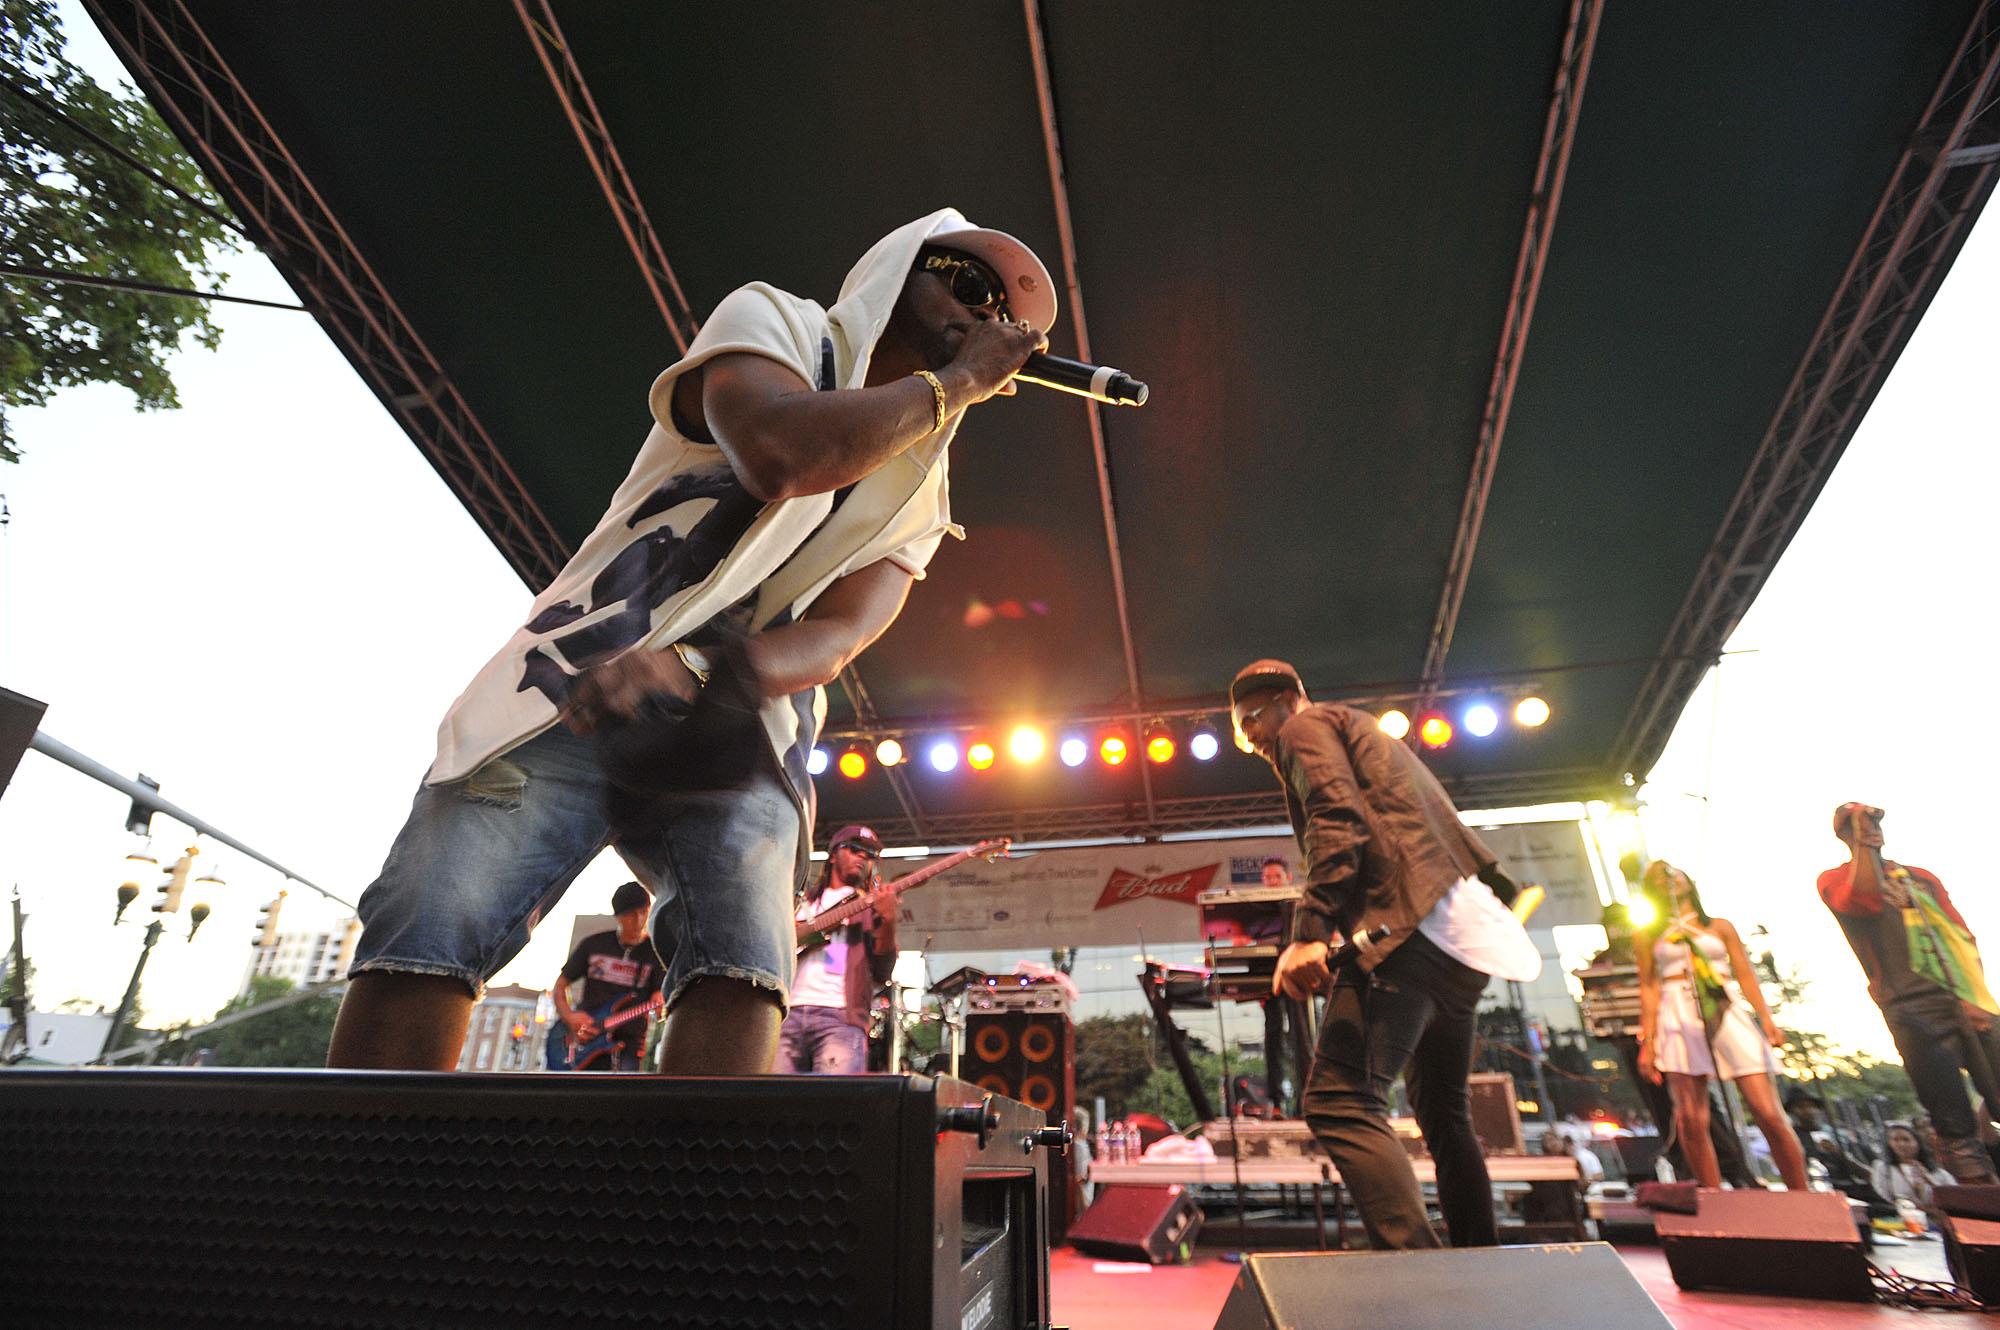 Shaggy, 98 Degrees, T-Pain headline Alive@Five concerts